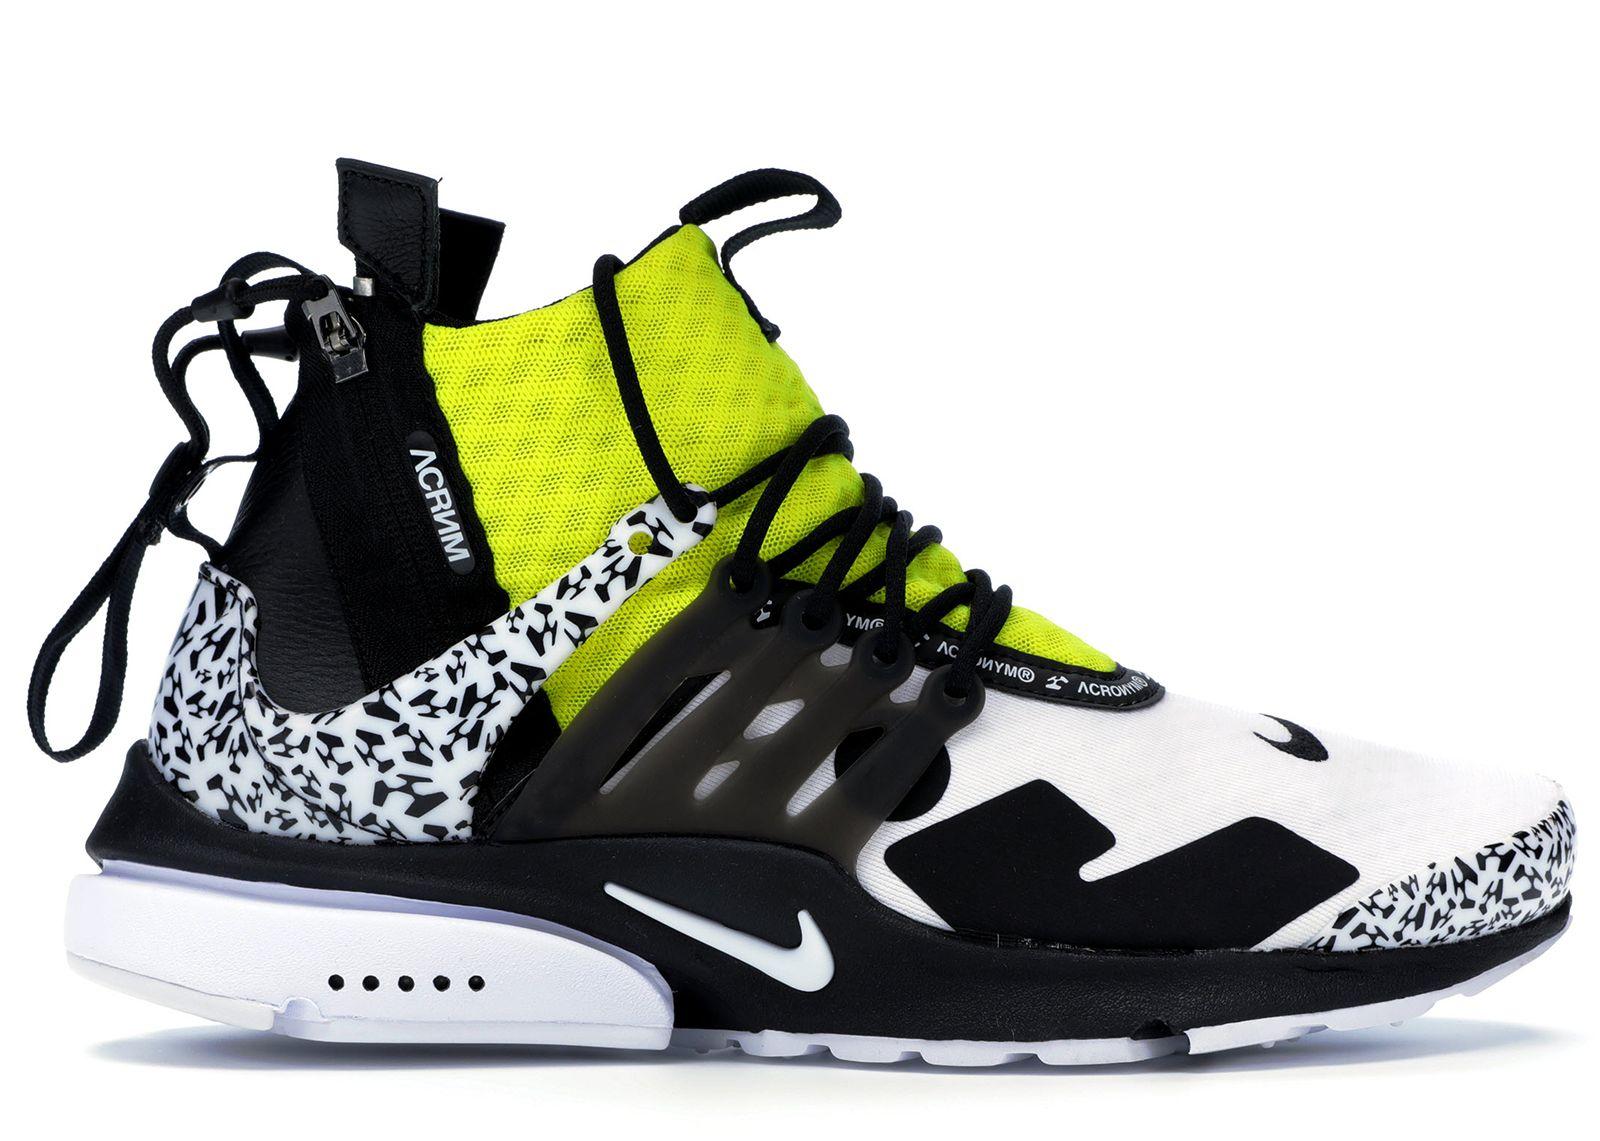 Pre-Owned Nike Air Presto Mid Acronym